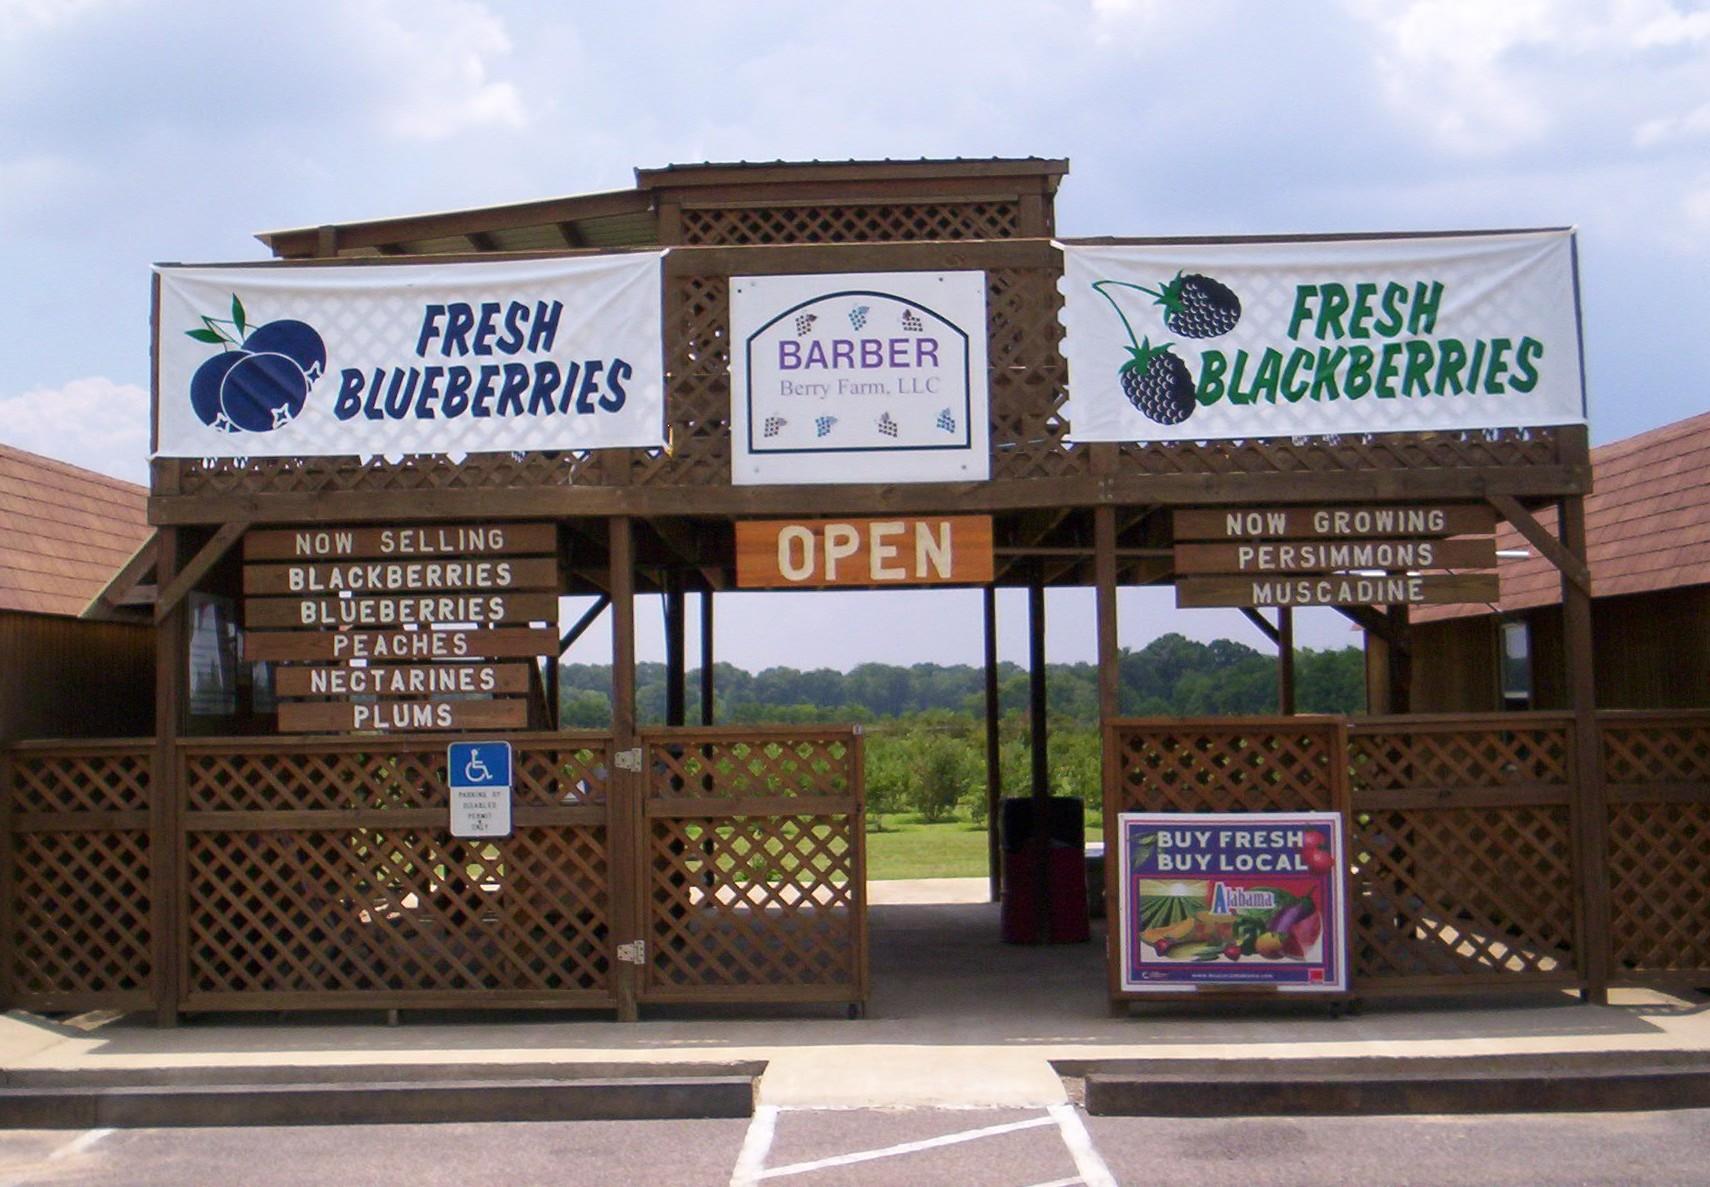 Barber Berry Farm, LLC